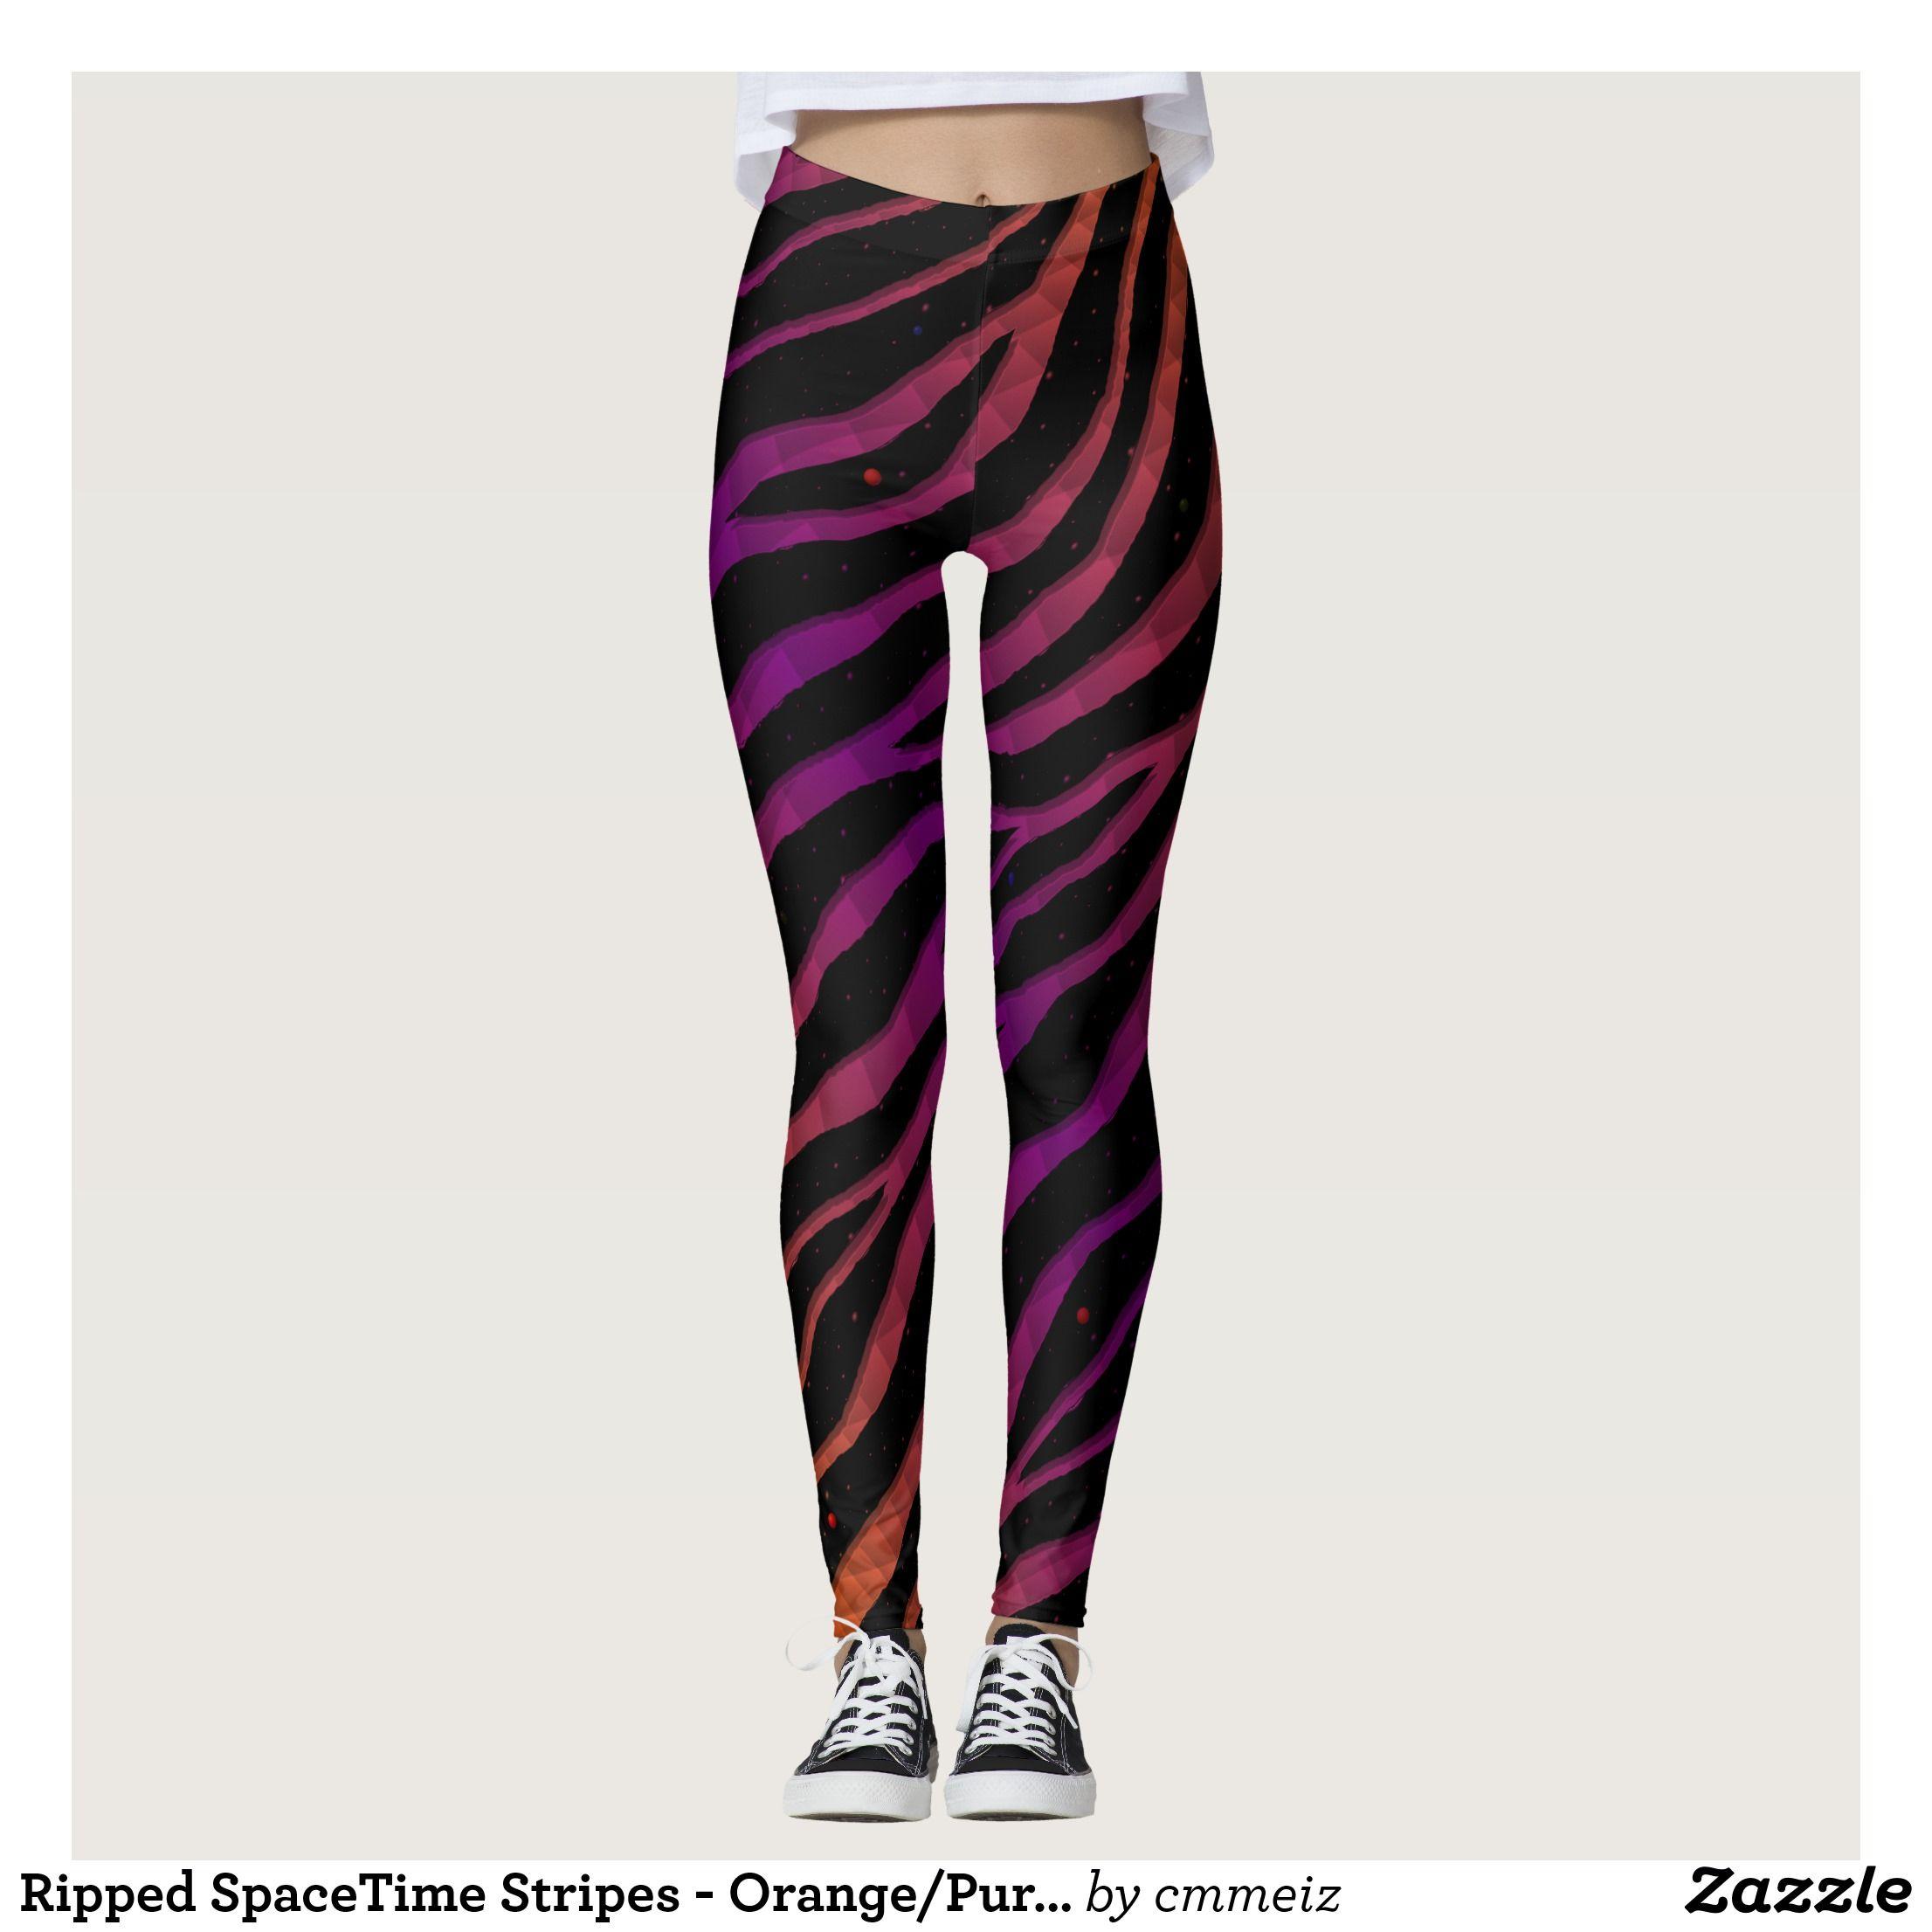 9183f039ed7 Ripped SpaceTime Stripes - Orange Purple Leggings   Beautiful  Yoga Pants -   Exercise